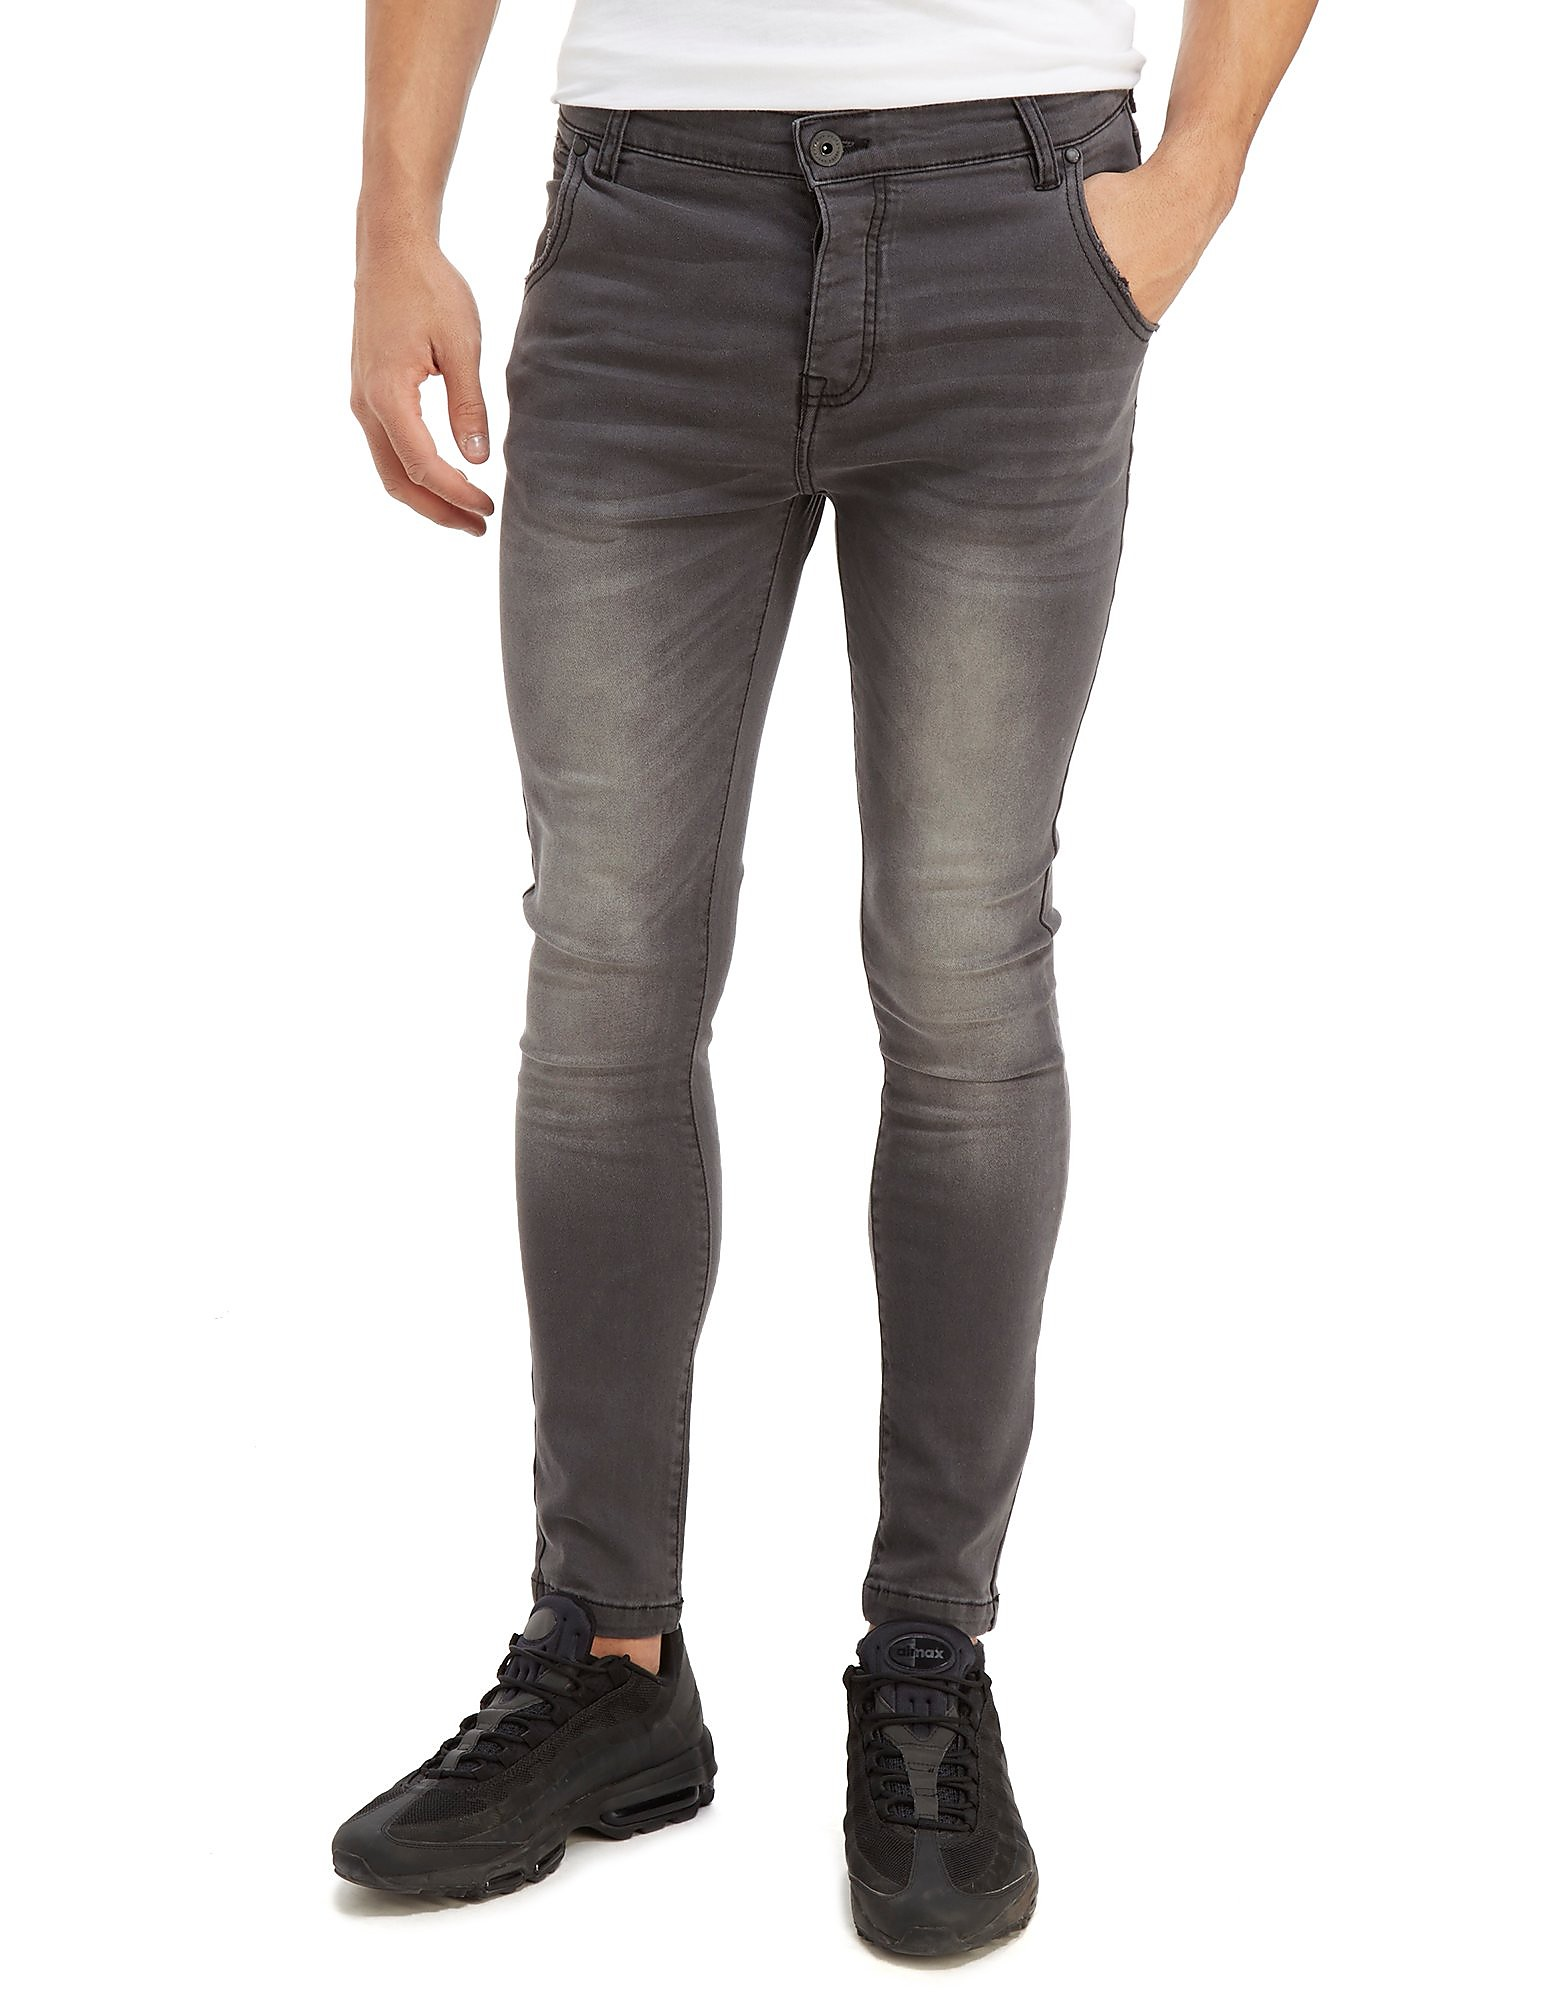 Nanny State Super Skinny Jeans